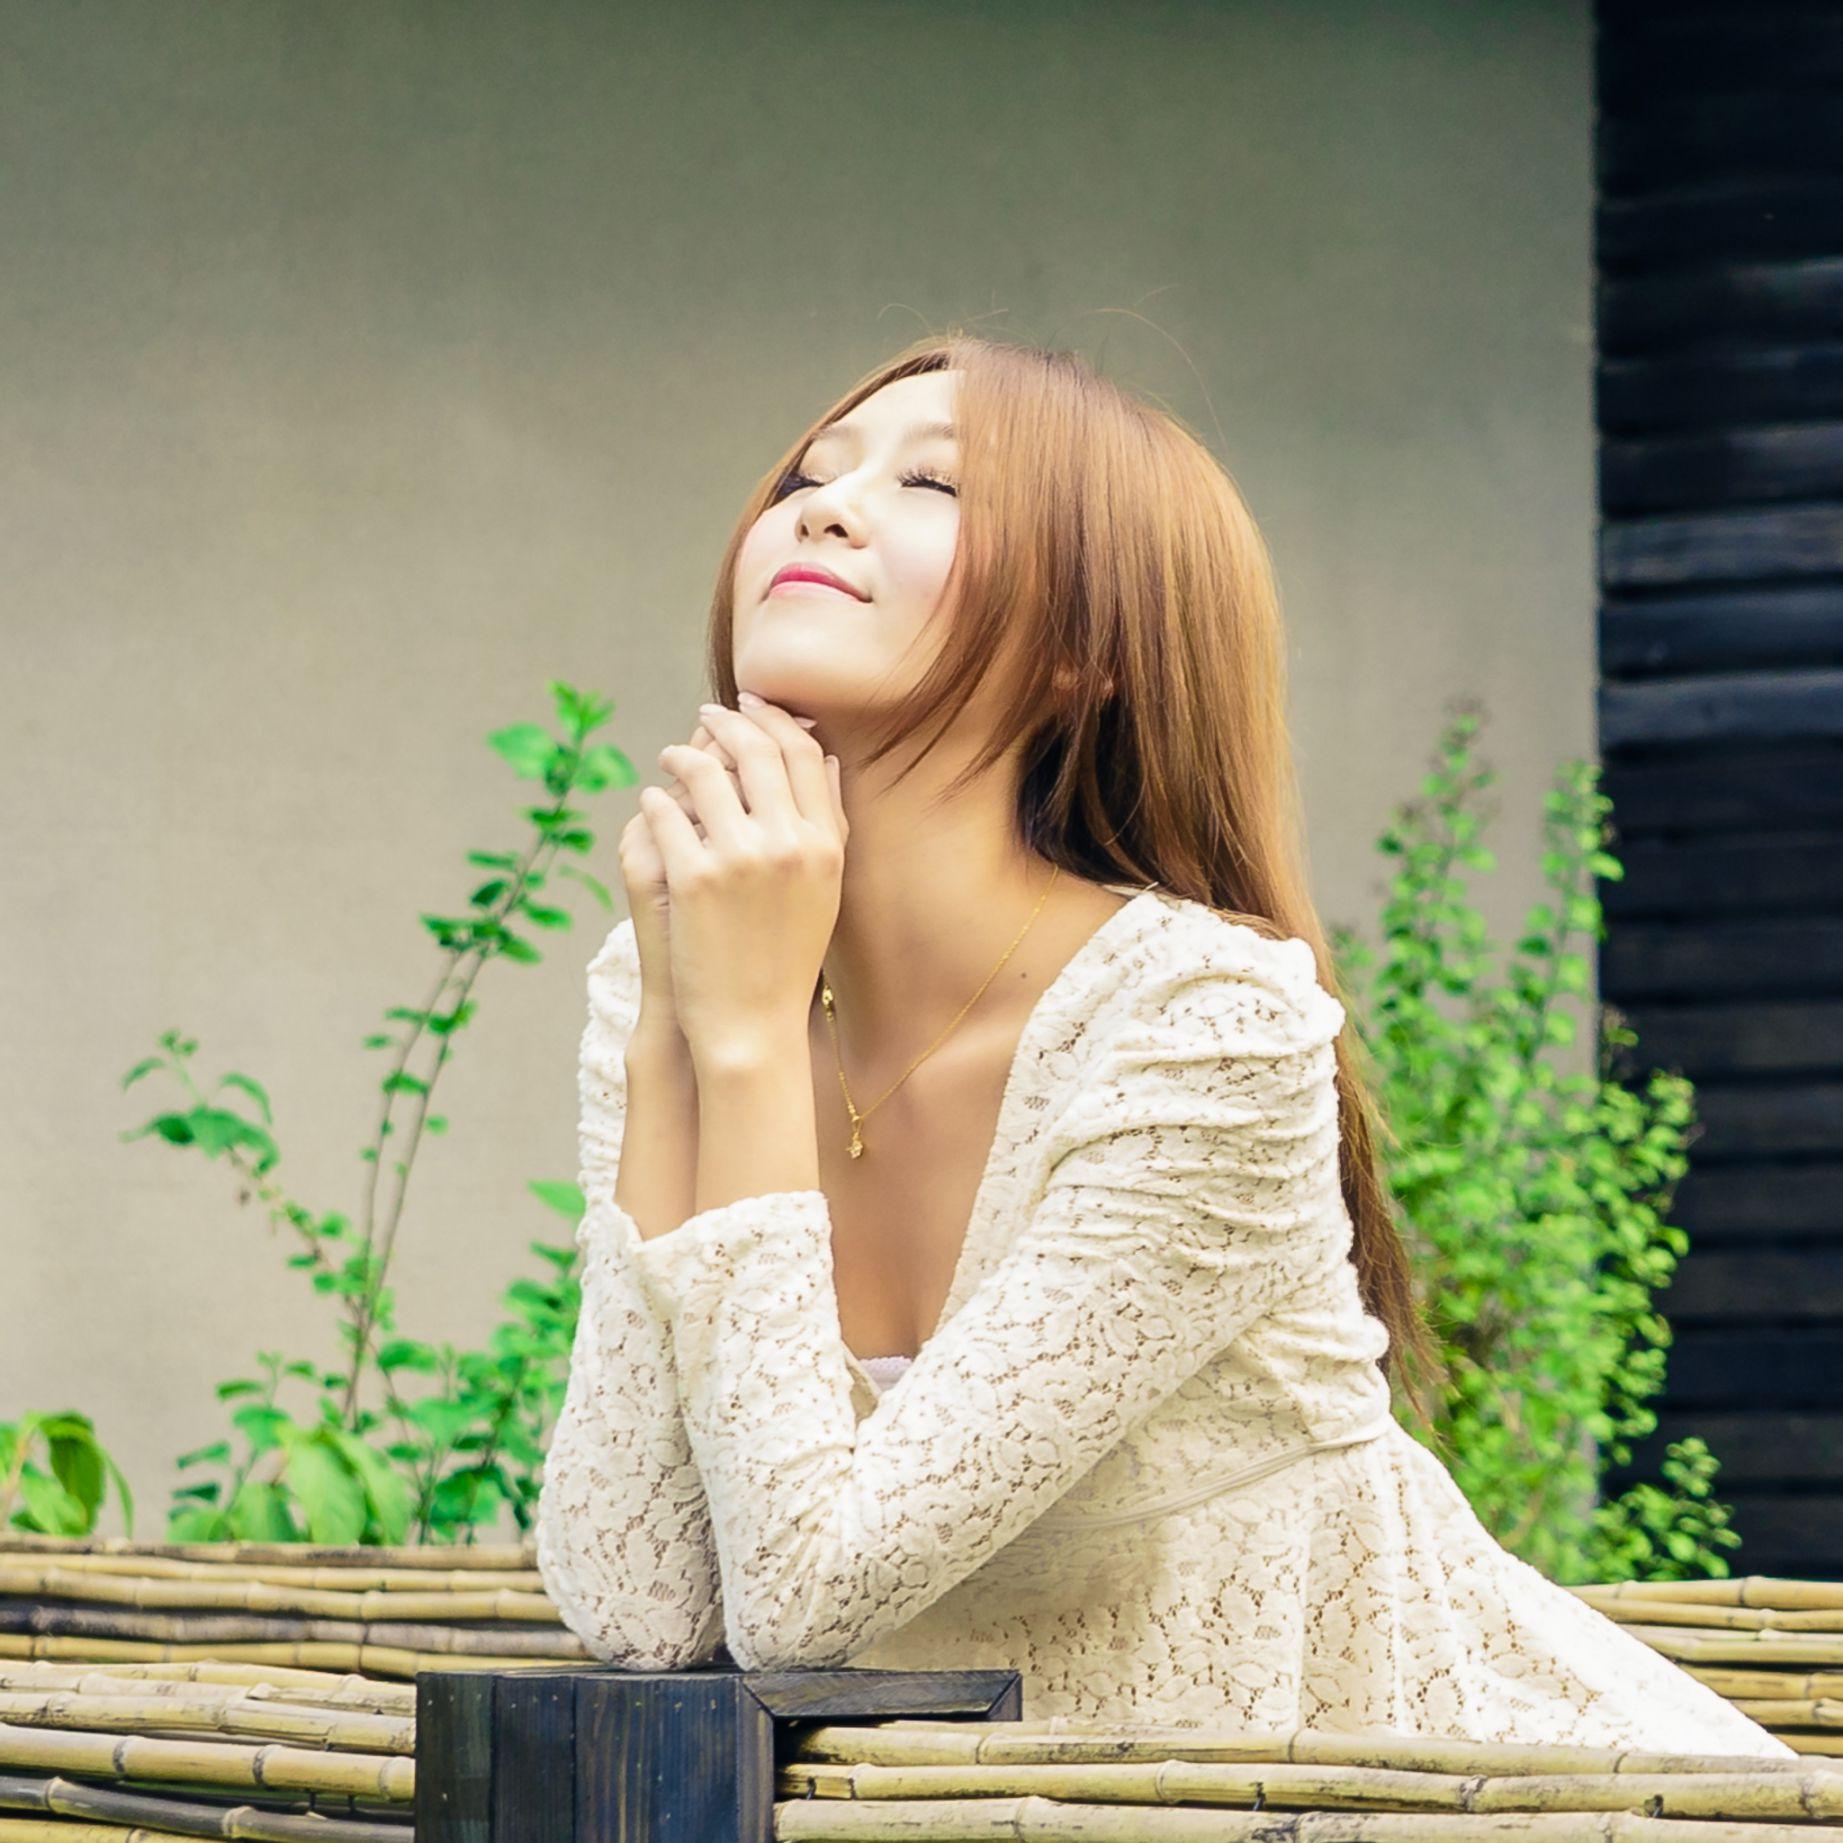 VOL.1386 [台湾正妹]牛仔紧身裤户外美女:Winnie小雪(庄咏惠,庄温妮,腿模Winnie)高品质写真套图(46P)